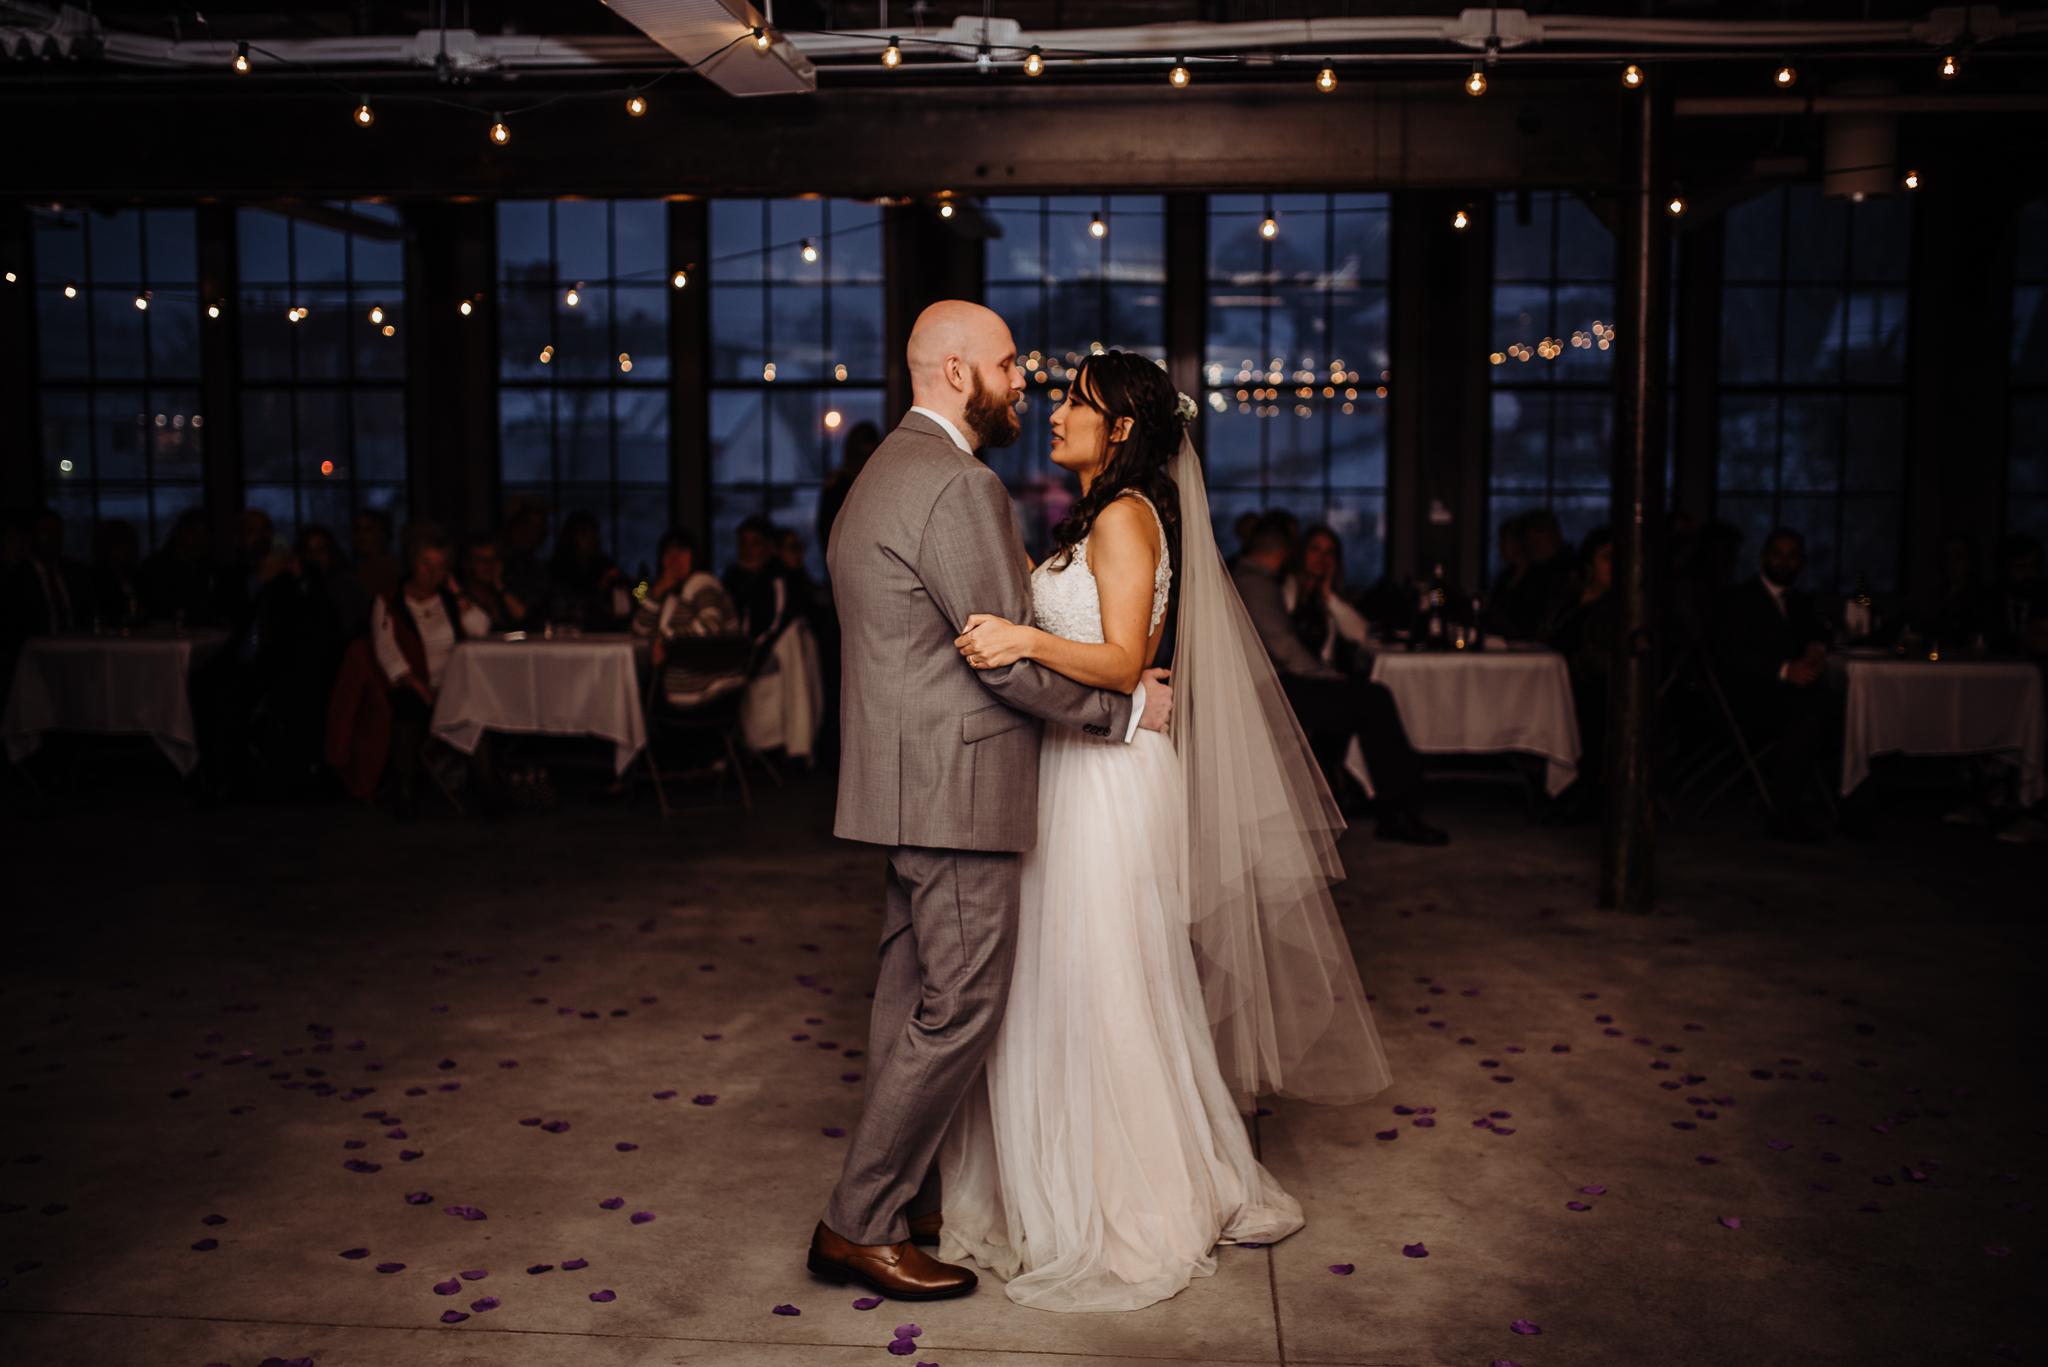 corinna Maine wedding Photography-17.jpg